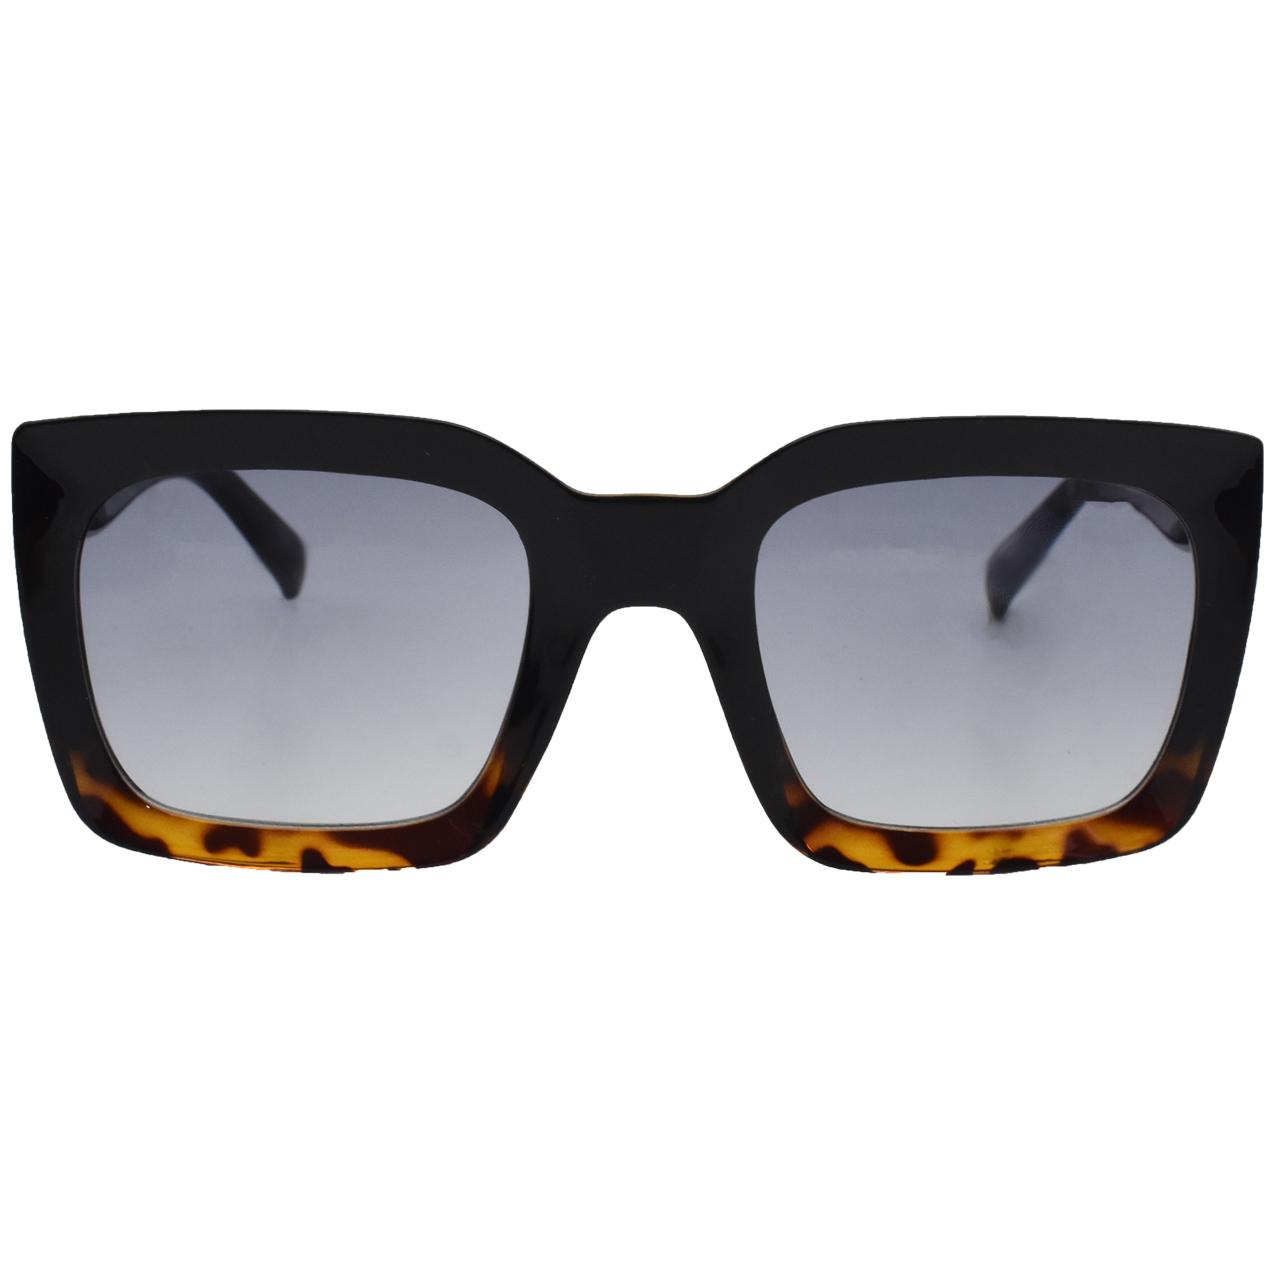 عینک آفتابی آکو مدل 41450BrP